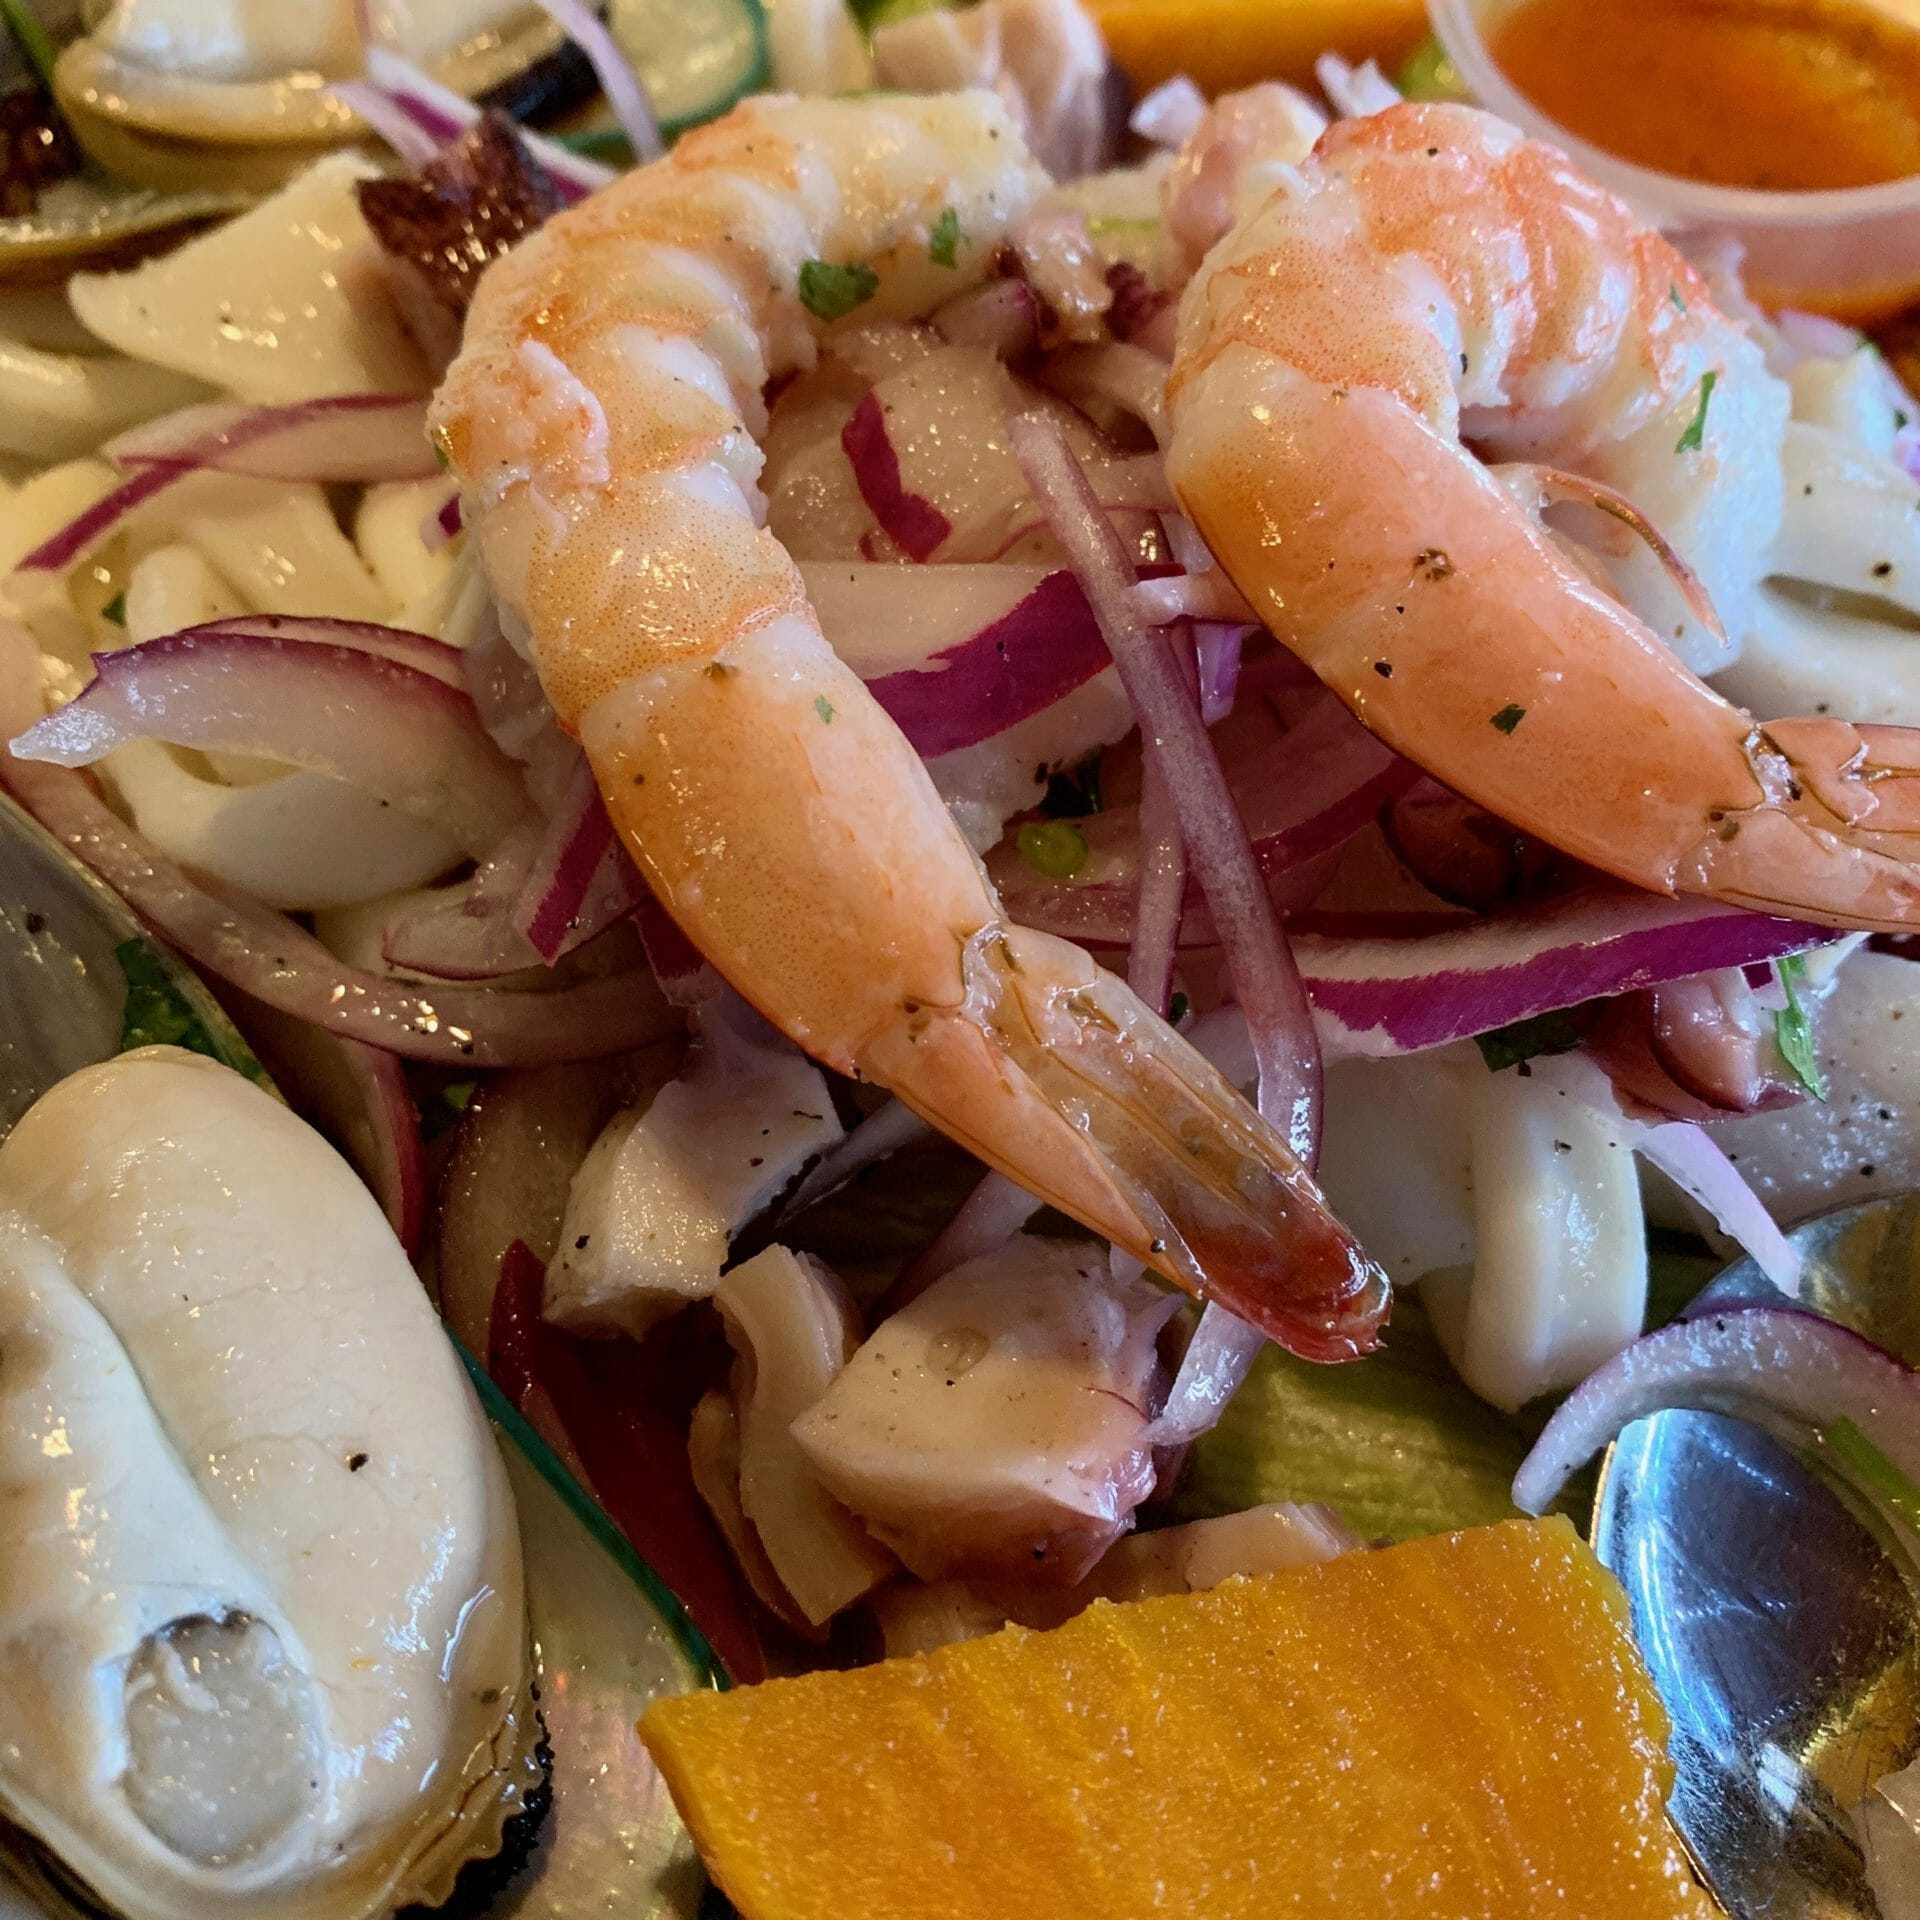 Mixed seafood platter (Mojito Cafe)